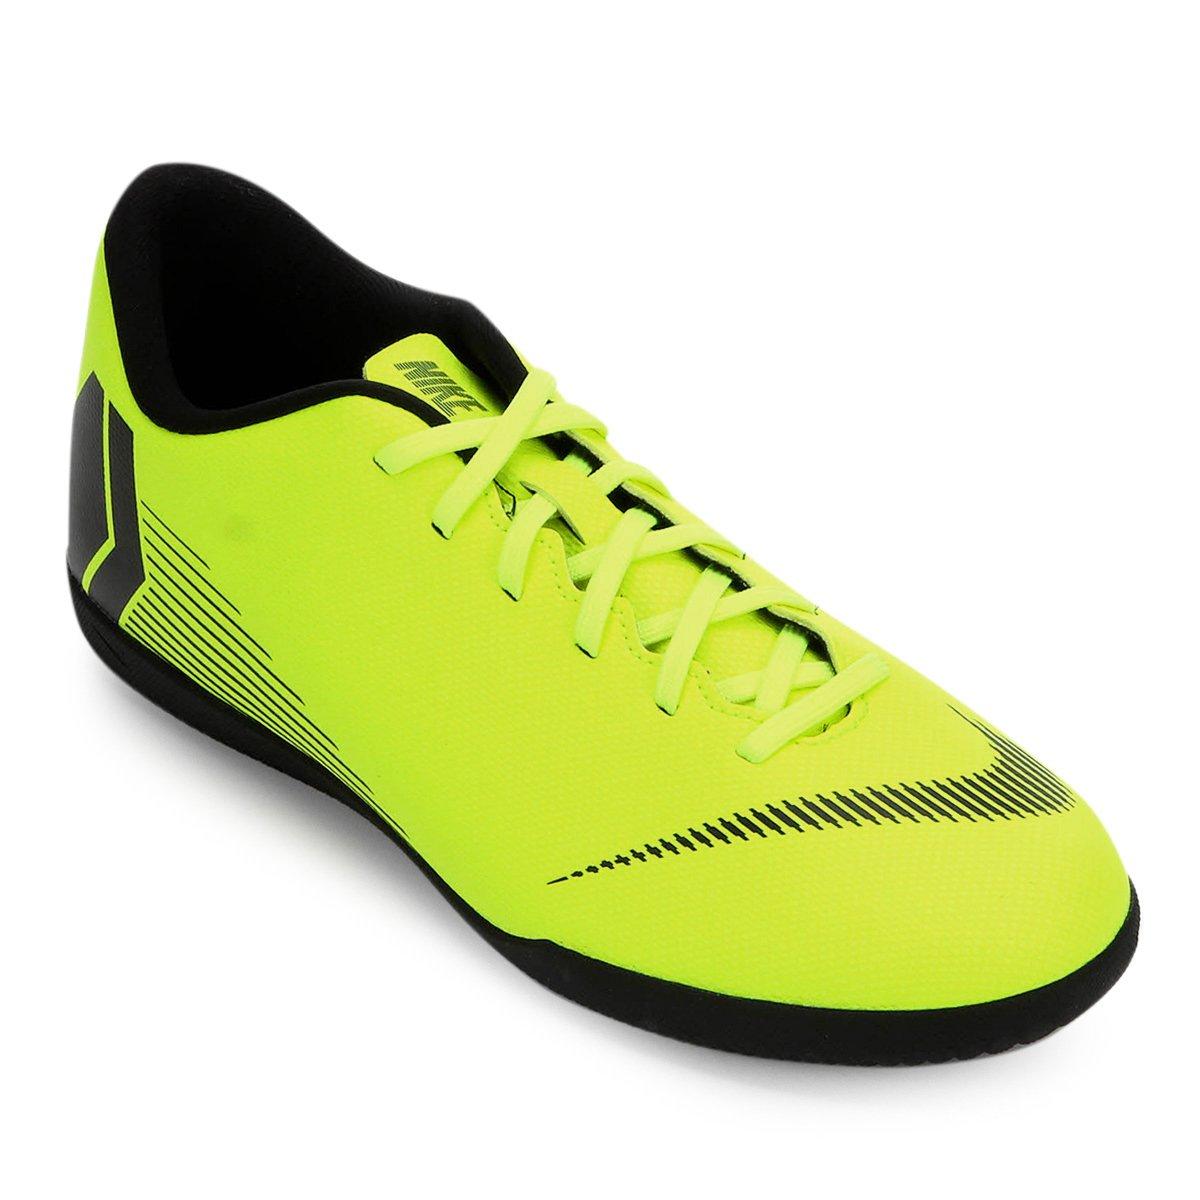 Chuteira Futsal Nike Mercurial Vapor 12 Club - Amarelo e Preto ... ce4dd5d335933